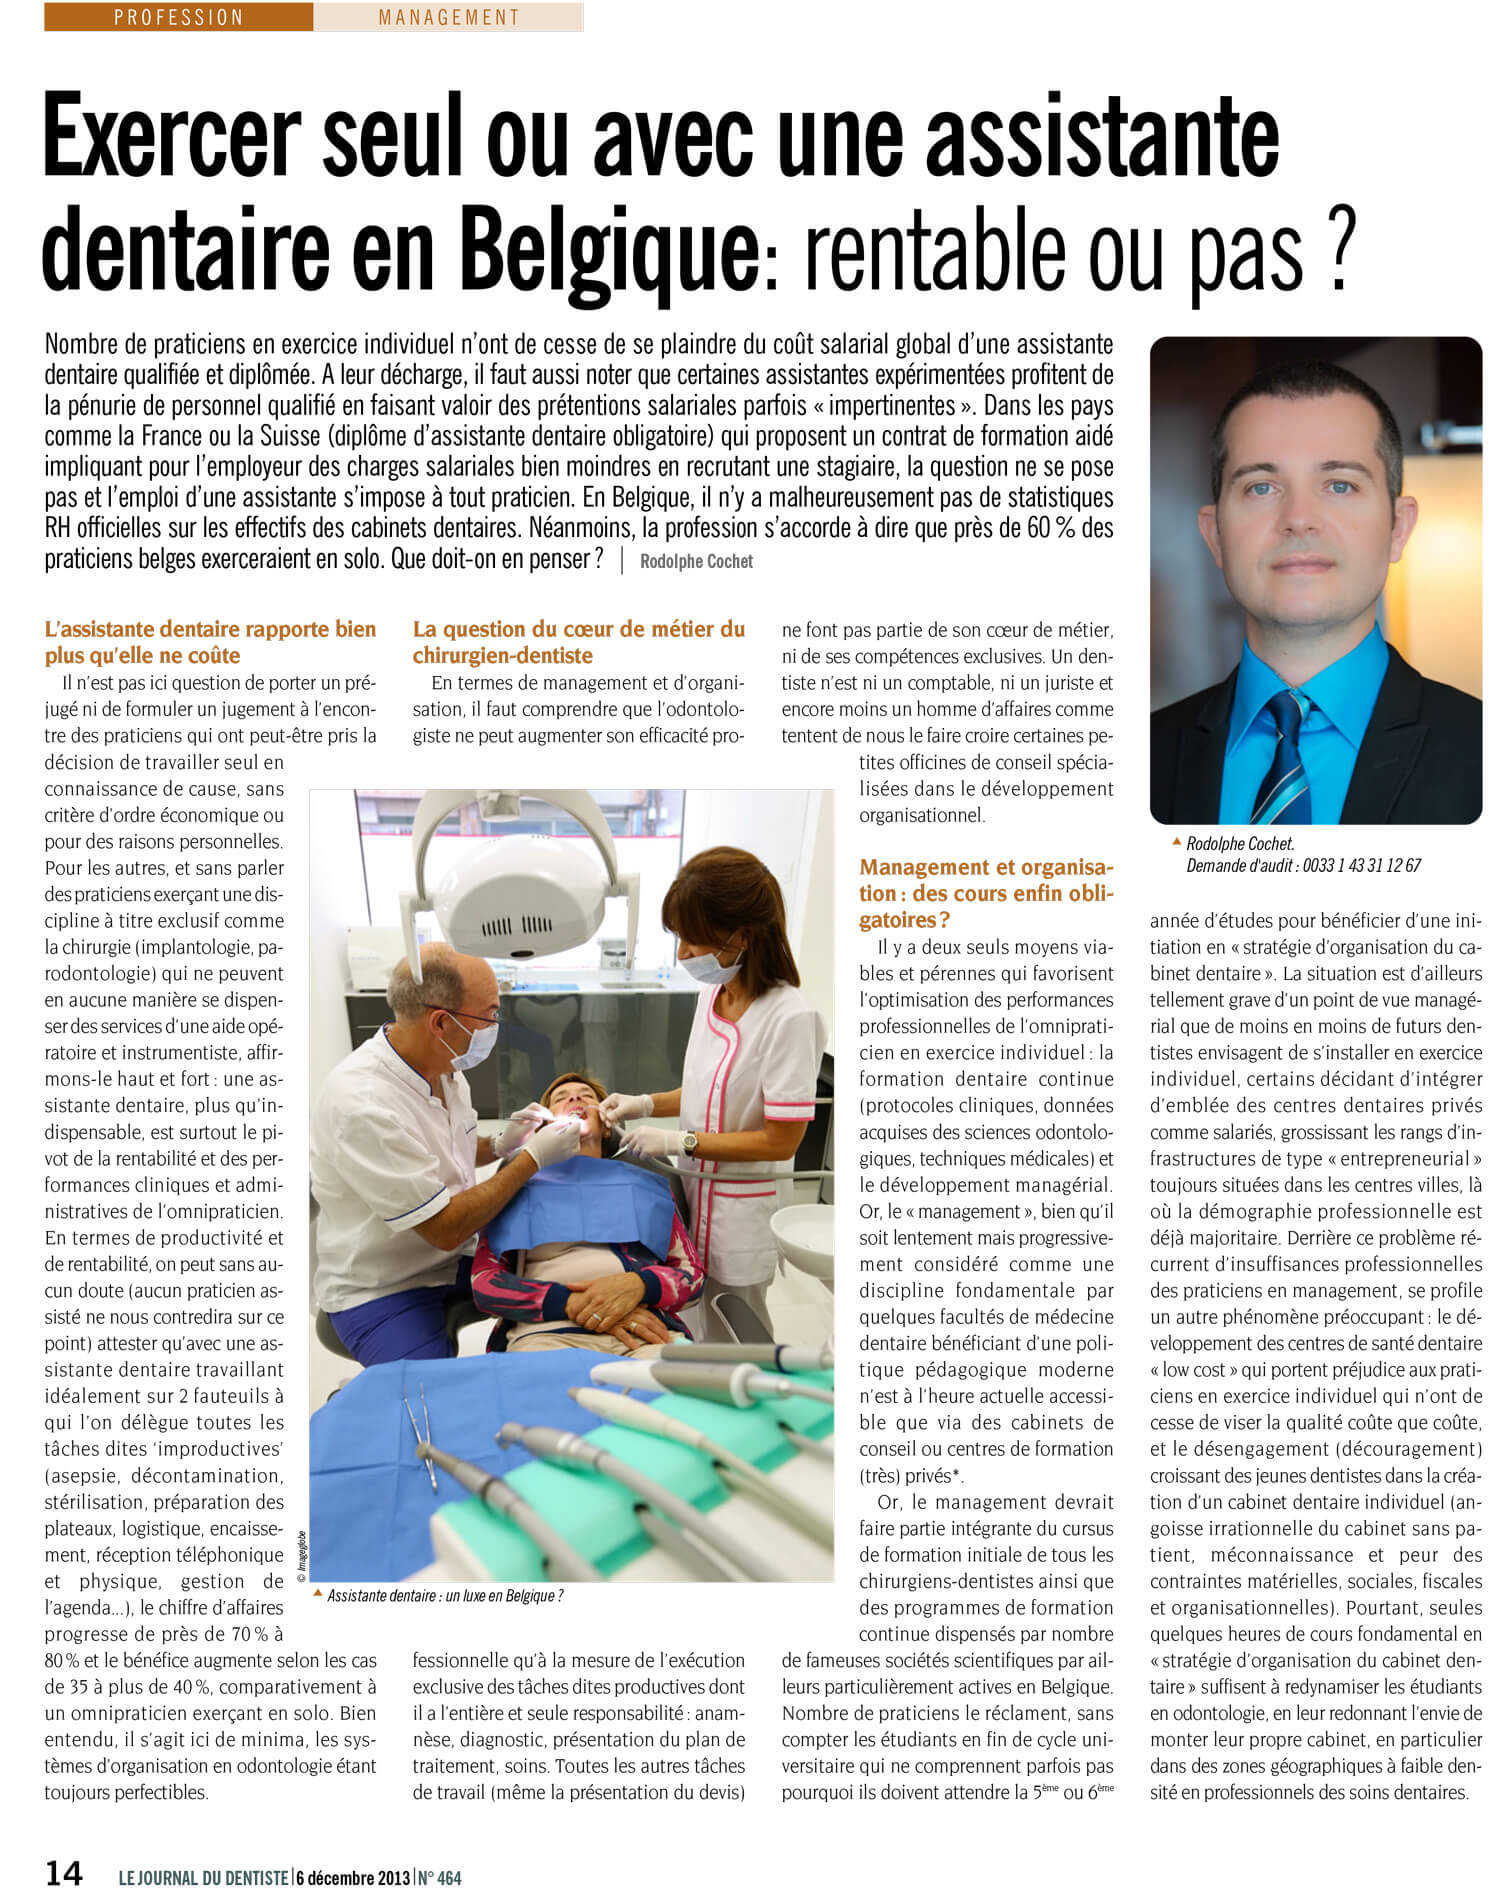 exercer-seul-avec-assistante-dentaire-belgique-rentable-Rodolphe-Cochet.jpg